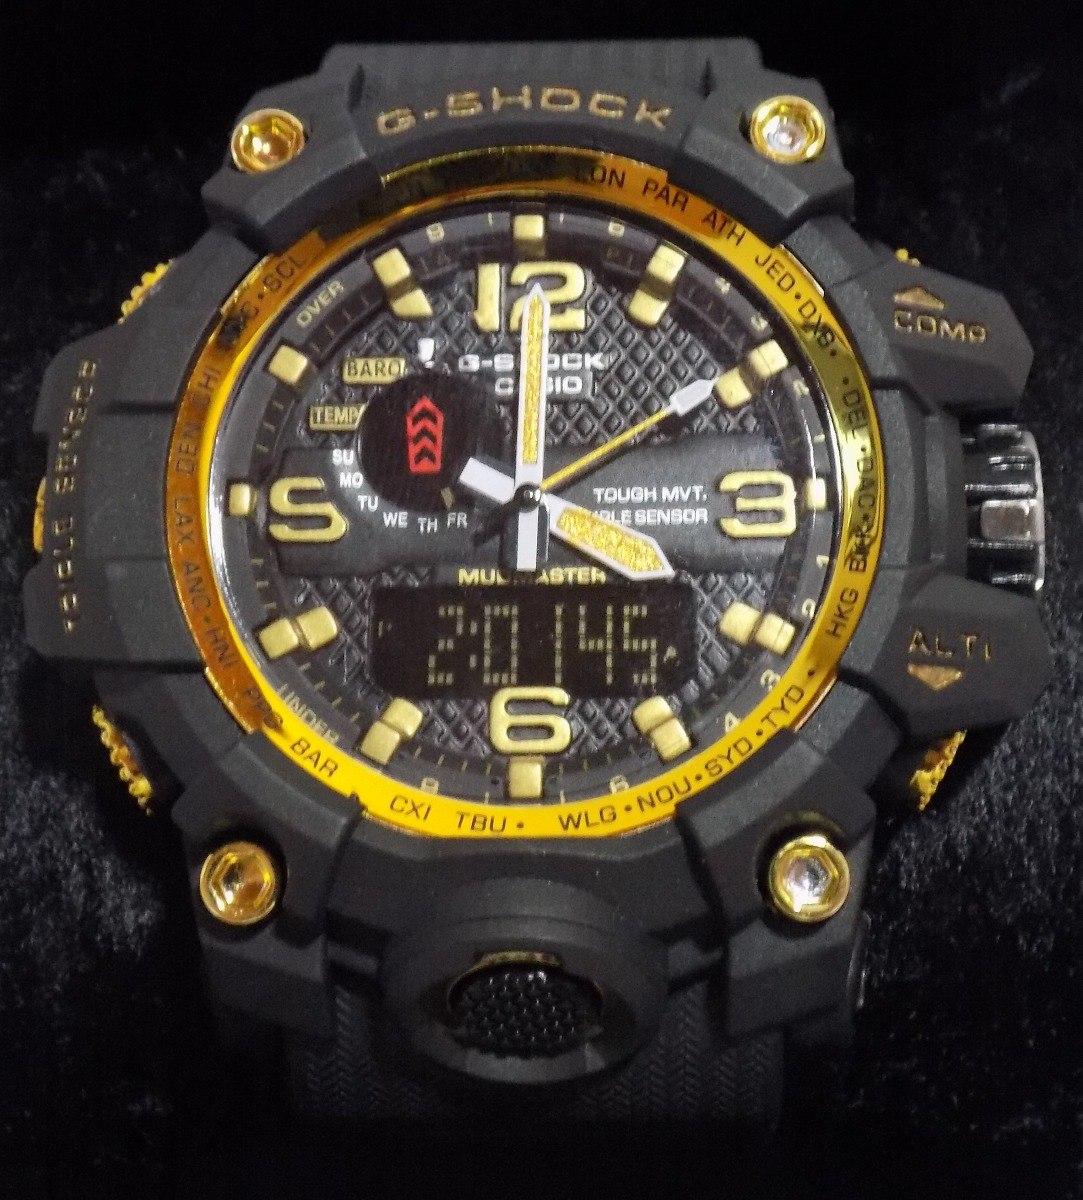 bc2fef84954 relógio g shock importado resistente a agua barato masculino. Carregando  zoom.